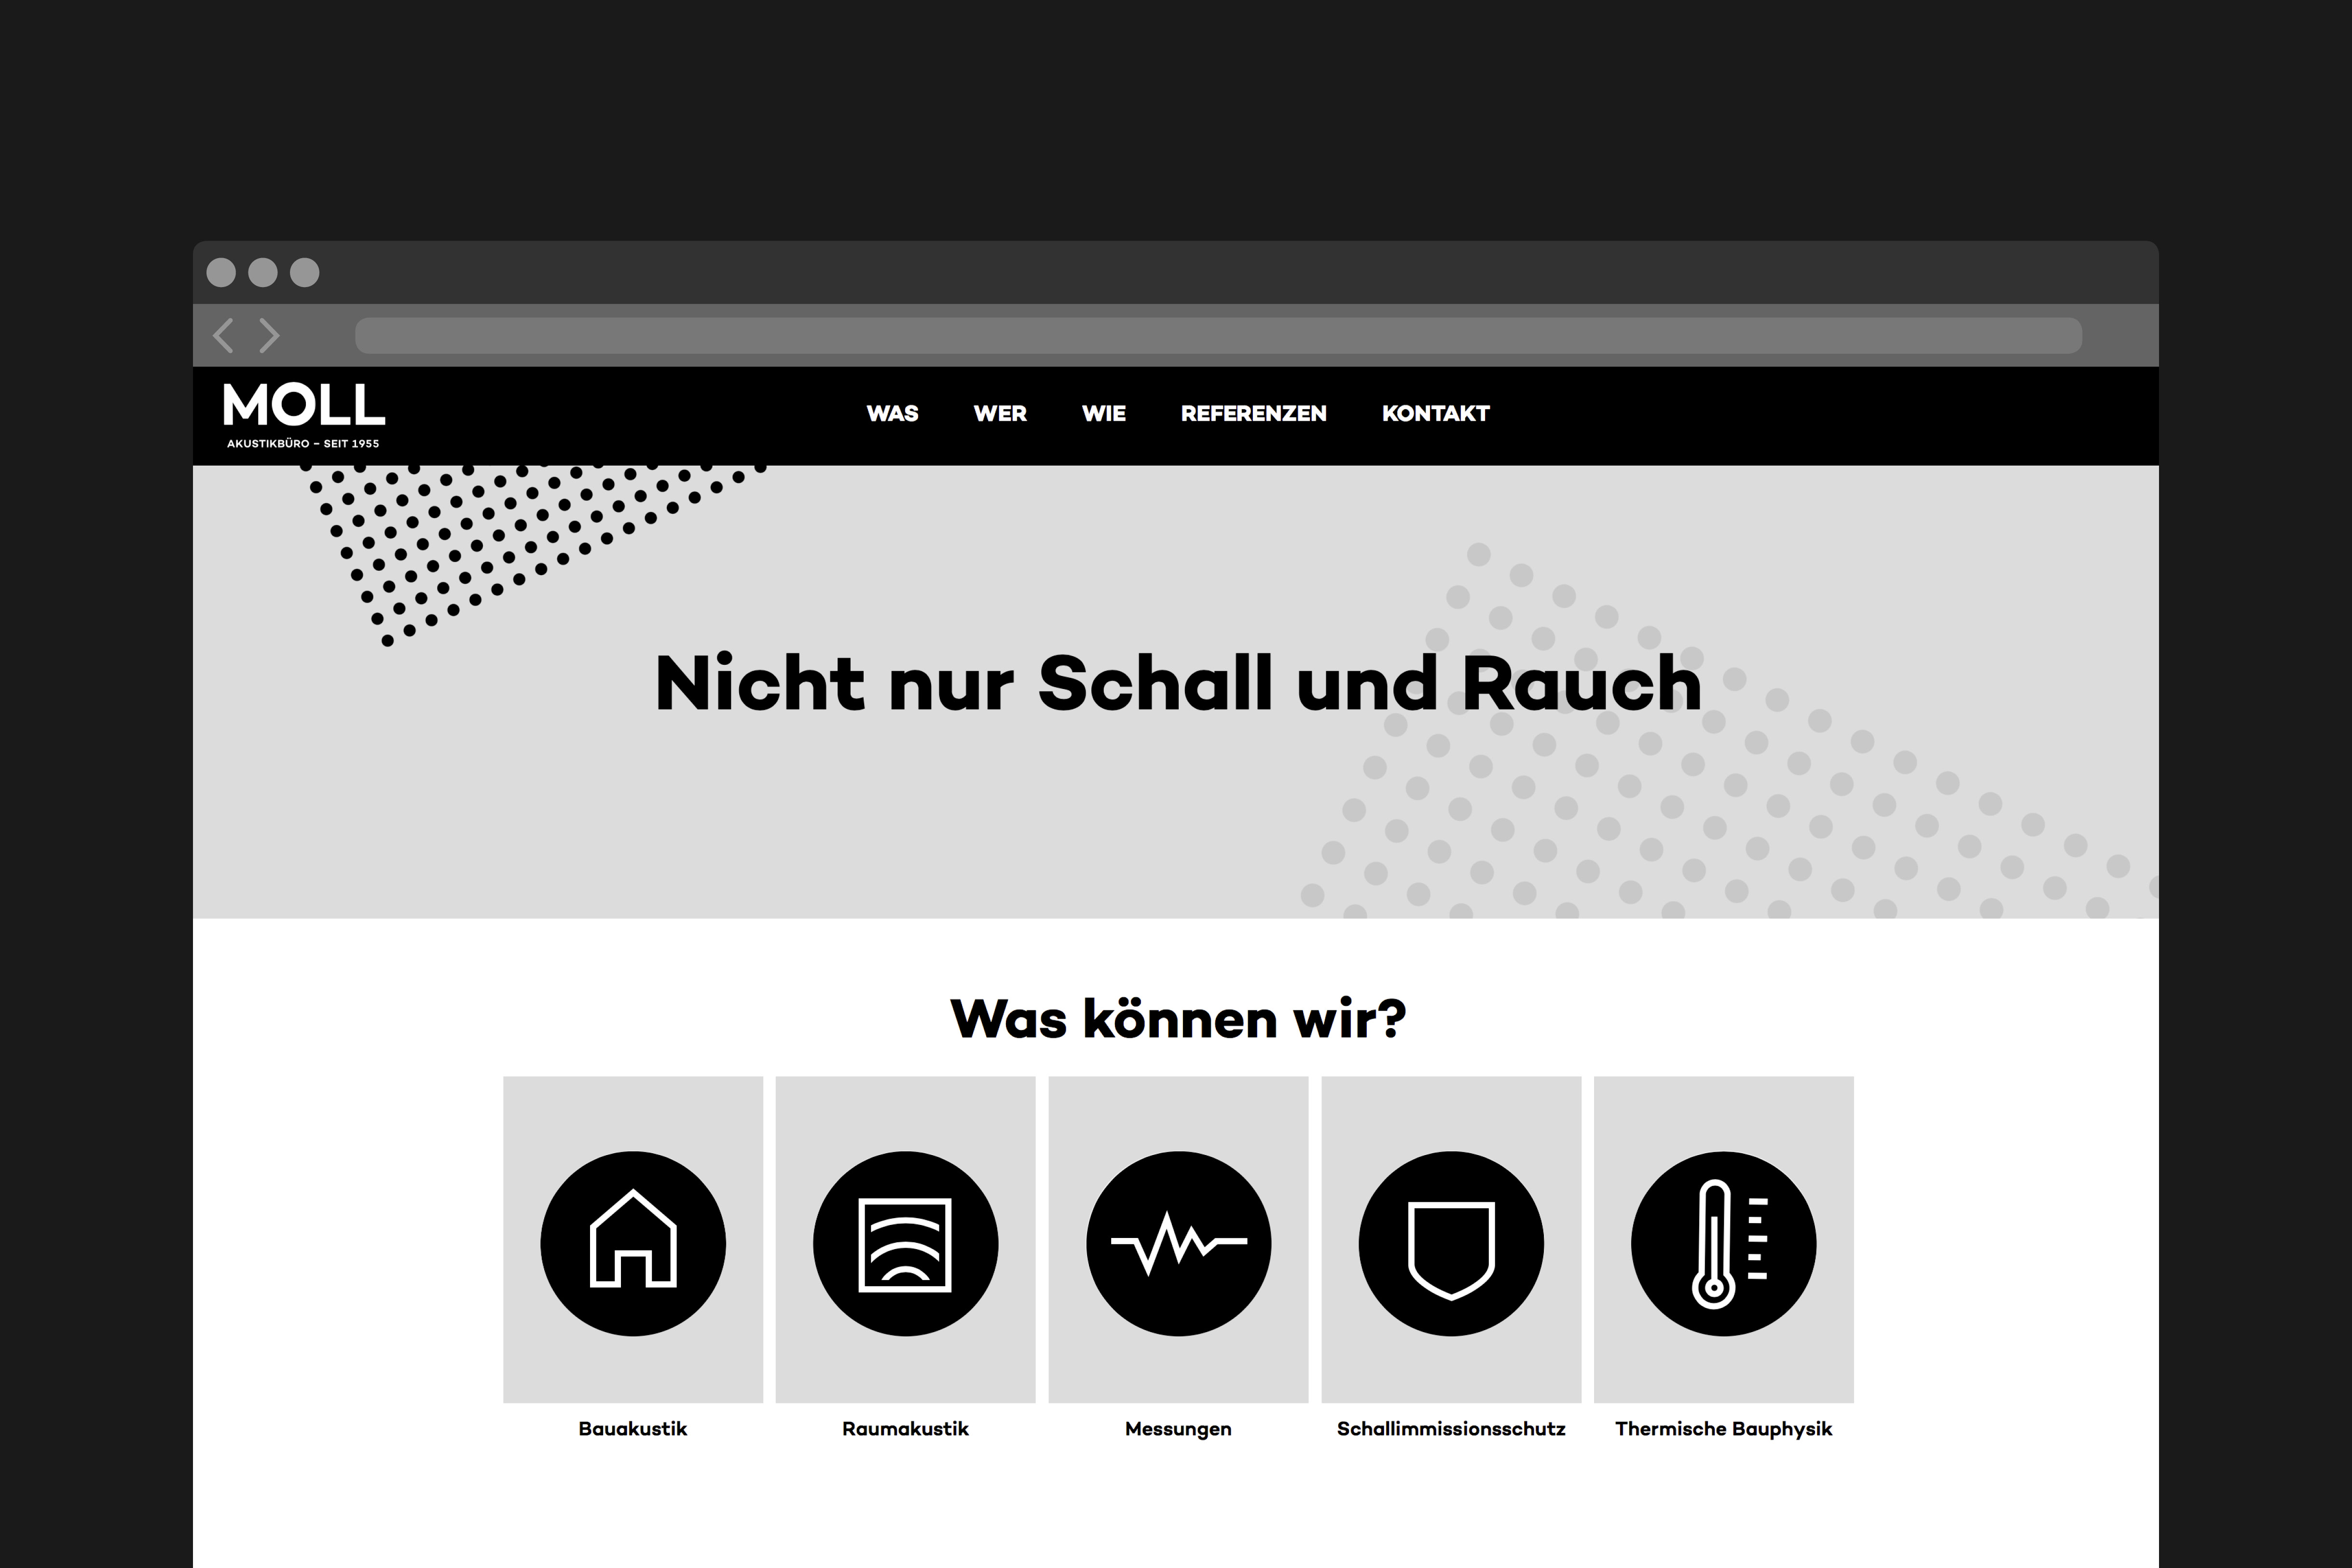 mab_Website_Mobile_Doku_fd-Webseite_Screens_schwarz_NEU